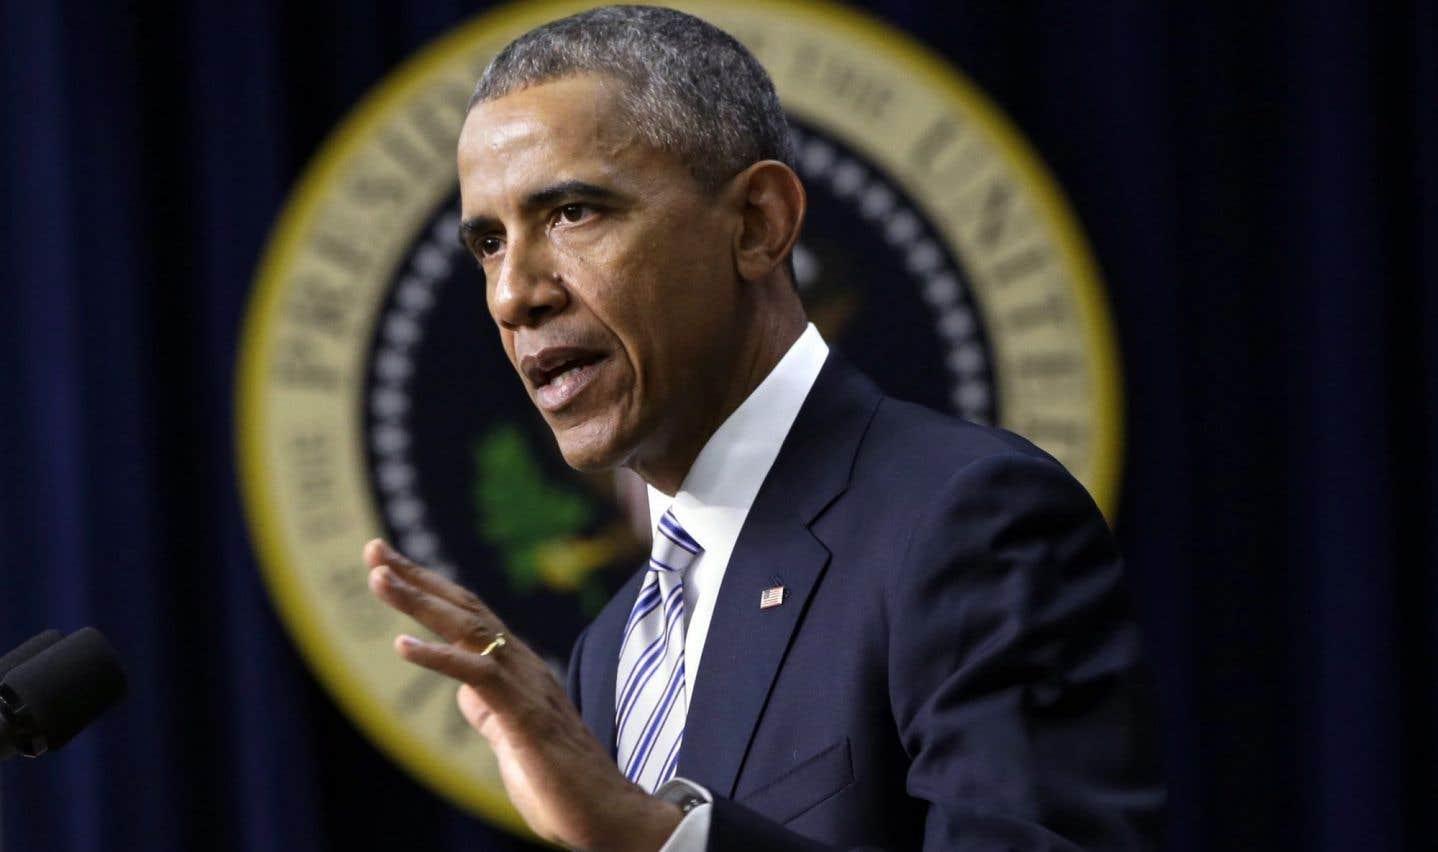 Obama dit non à Keystone XL